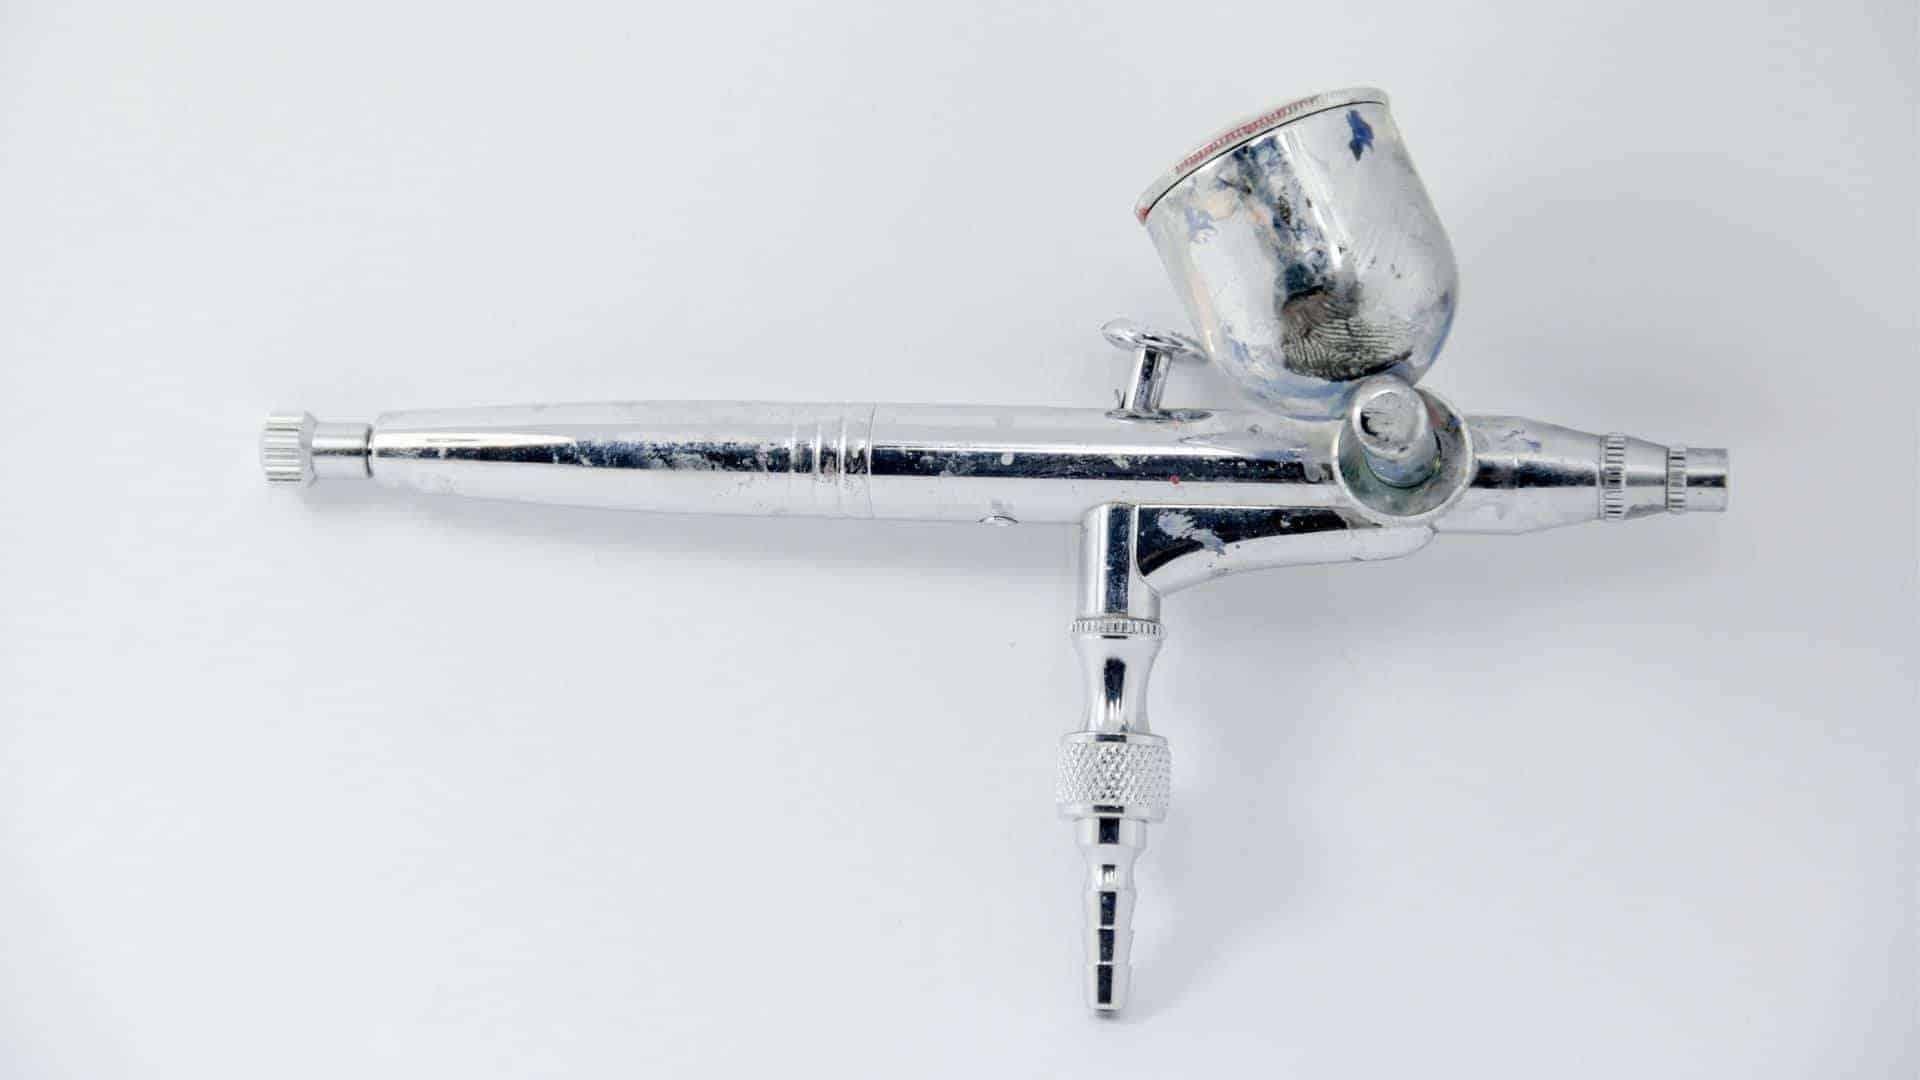 daniellatim A Terrivel Verdade Sobre os Aerografos da Wimpel 1920x1080 1